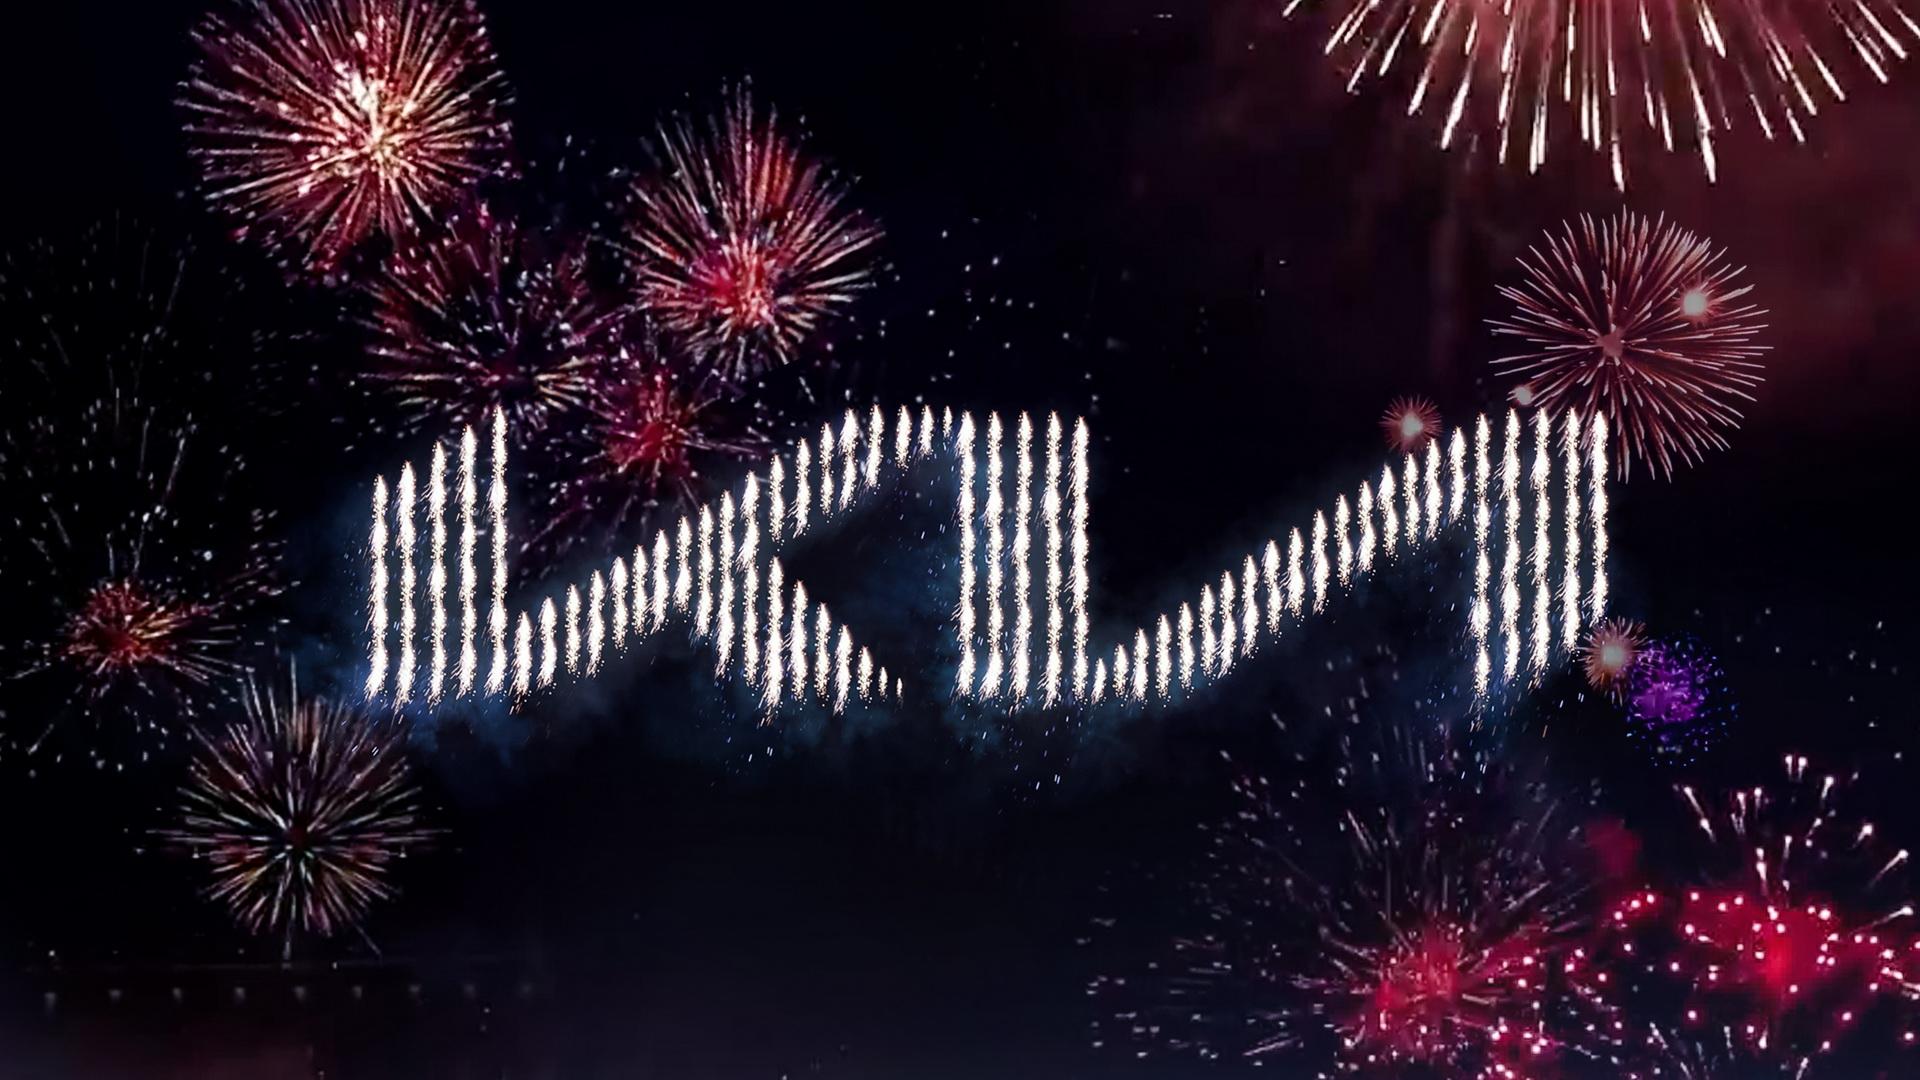 KIA rivela il nuovo logo